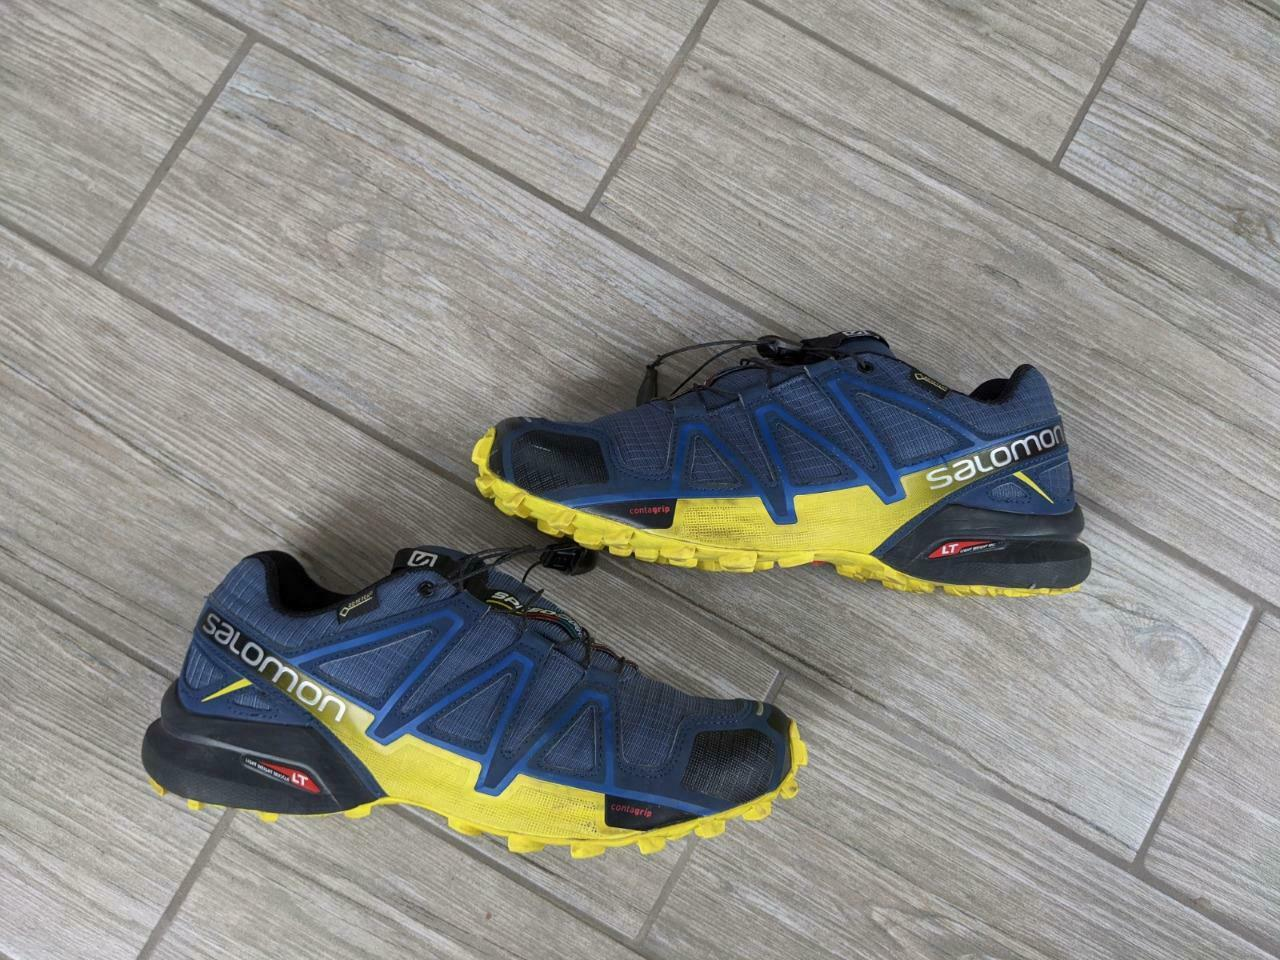 mens SALOMON shoes SPEED CROSS 4 goretex 8.5 US 42 EU running